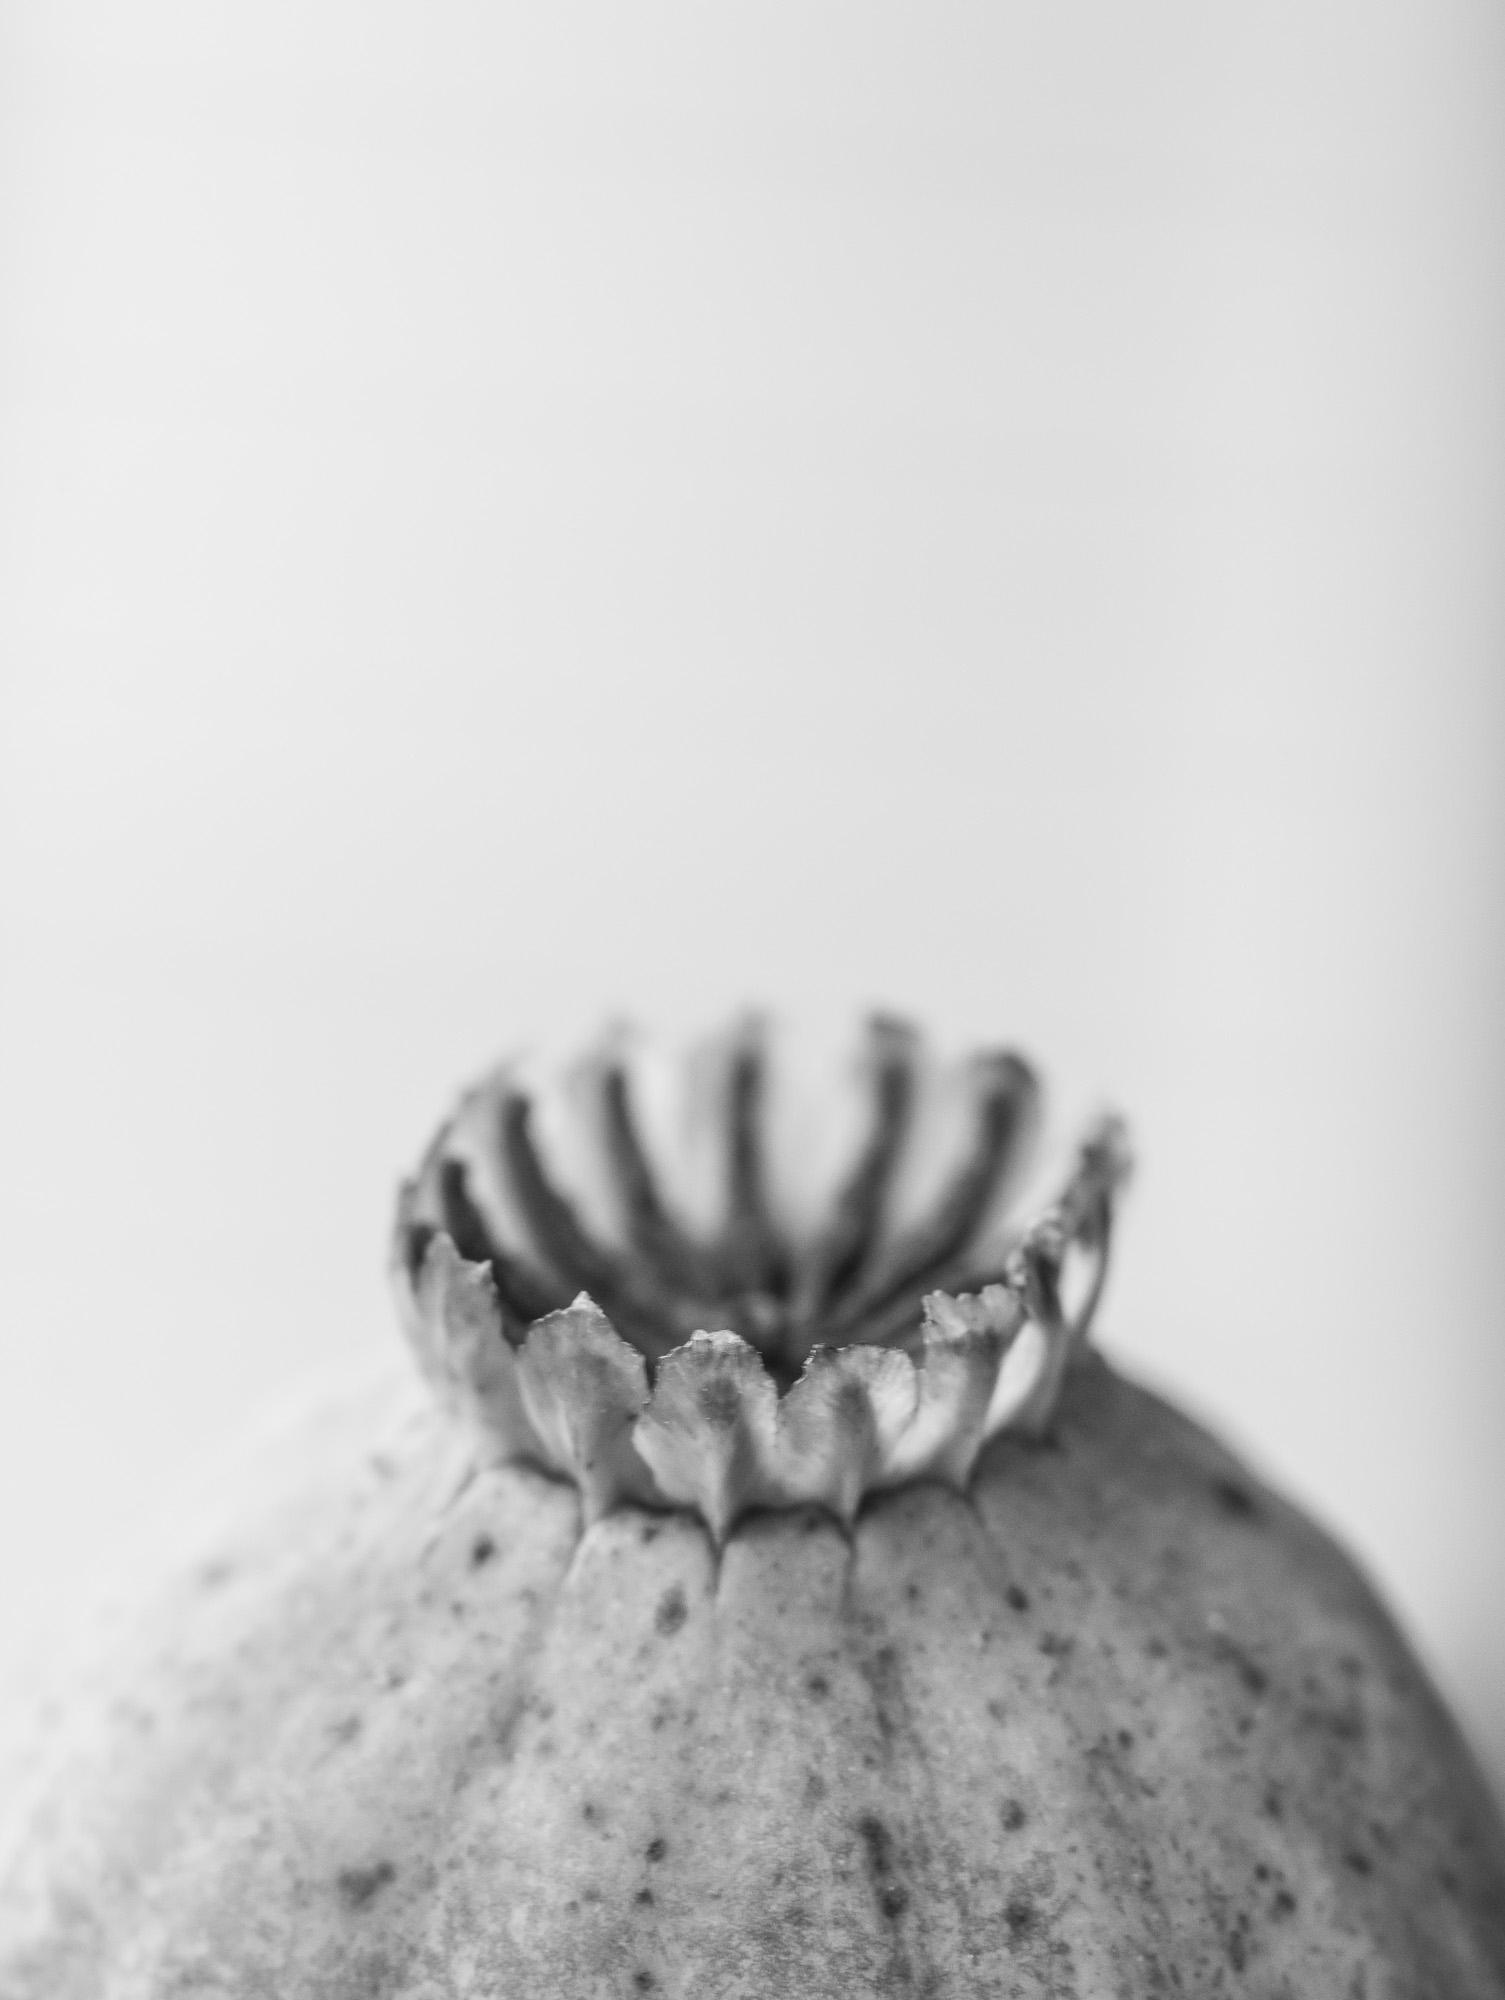 seedcase - nature, natureart, botanical - peter_skoglund   ello